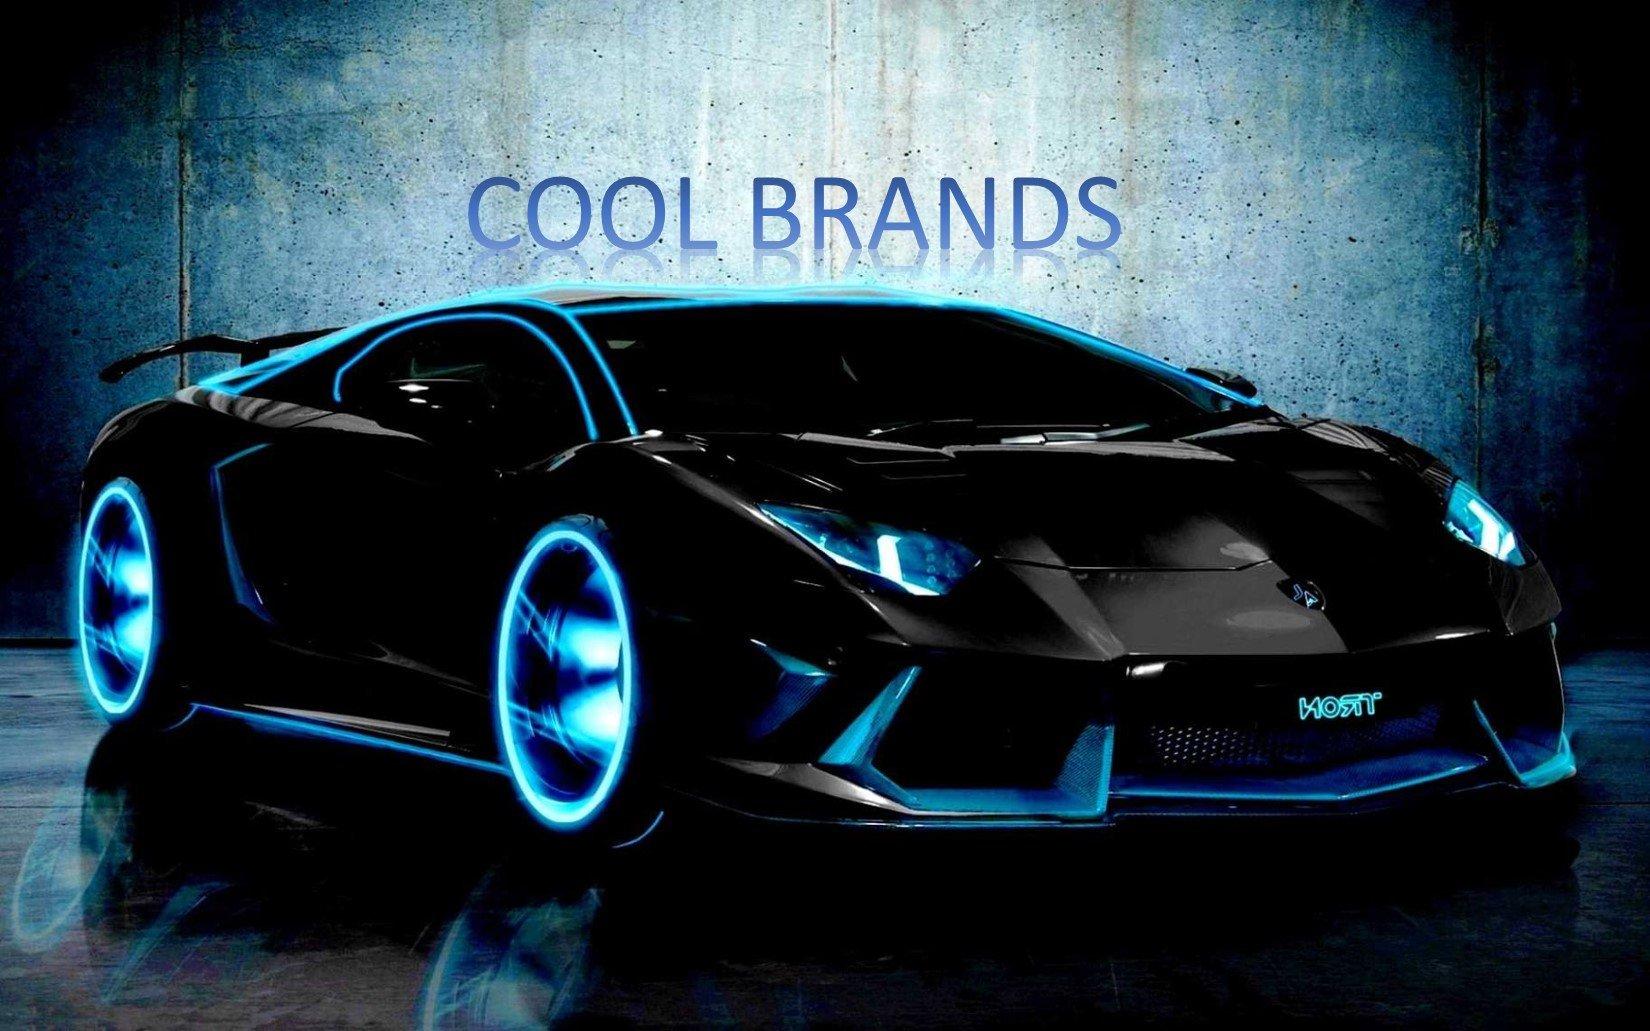 Cool Brands – The Cool Factors